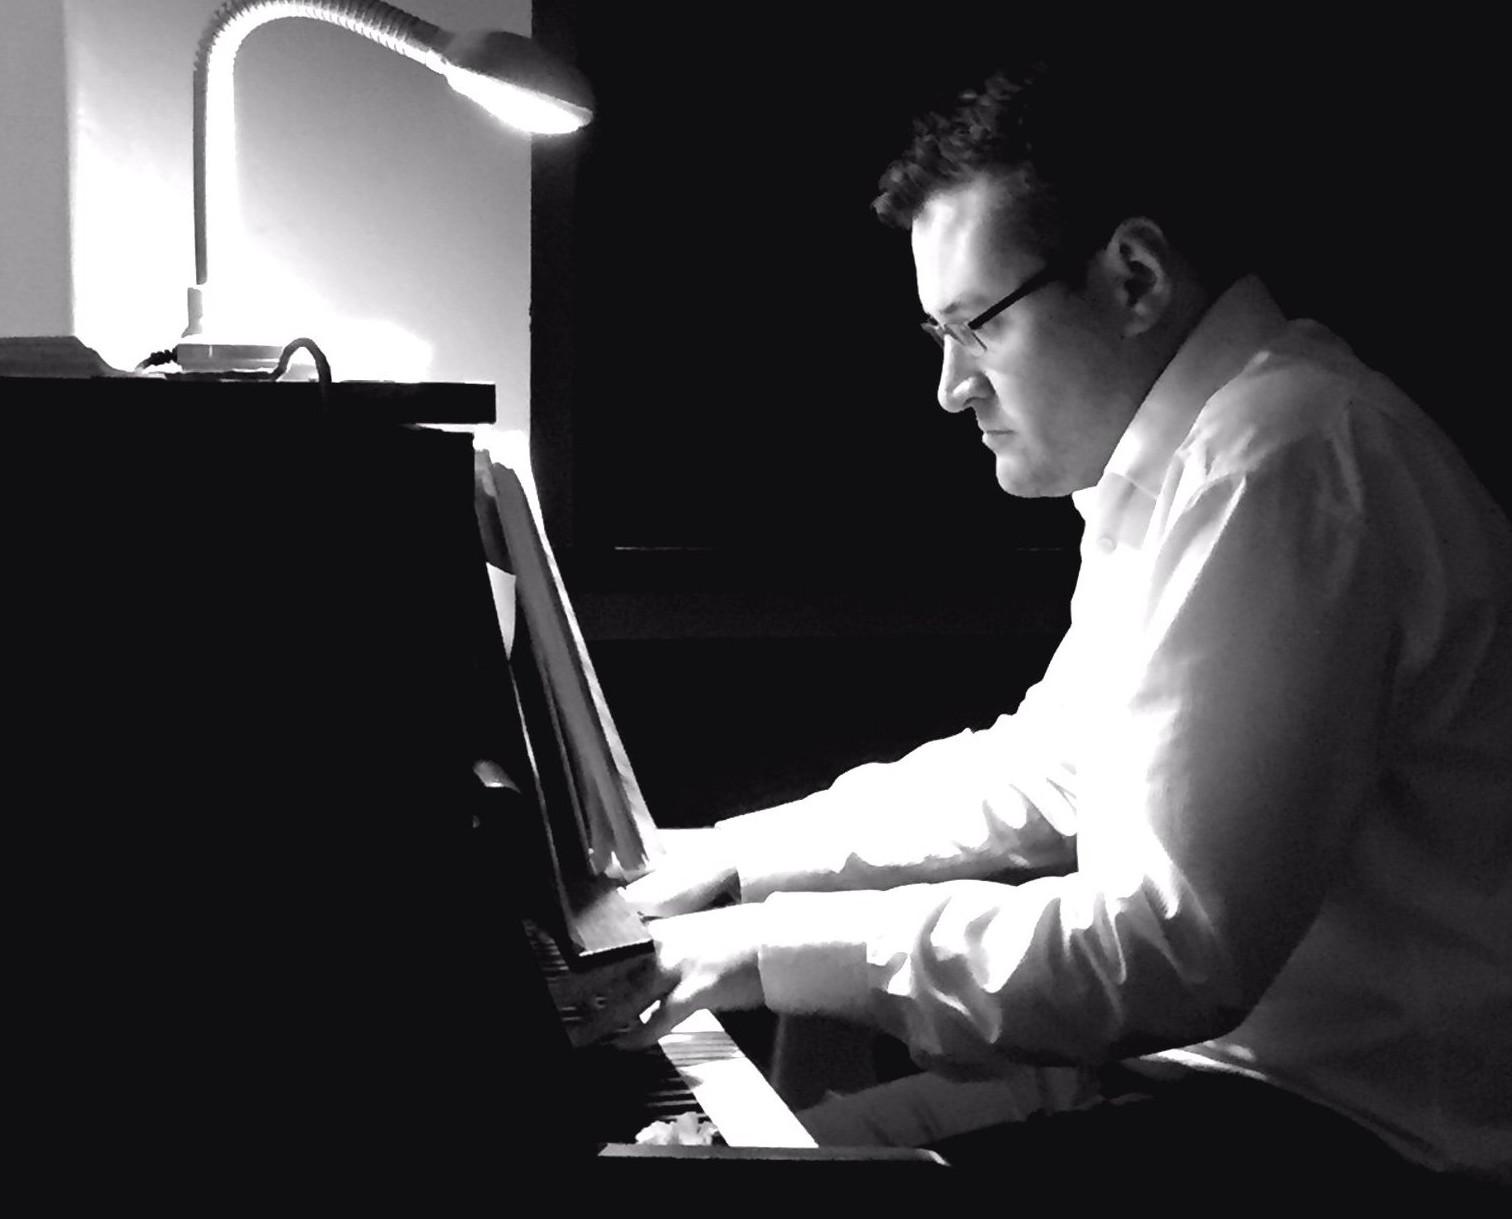 Steventon Choral Society's accompanist, Robert Thomas